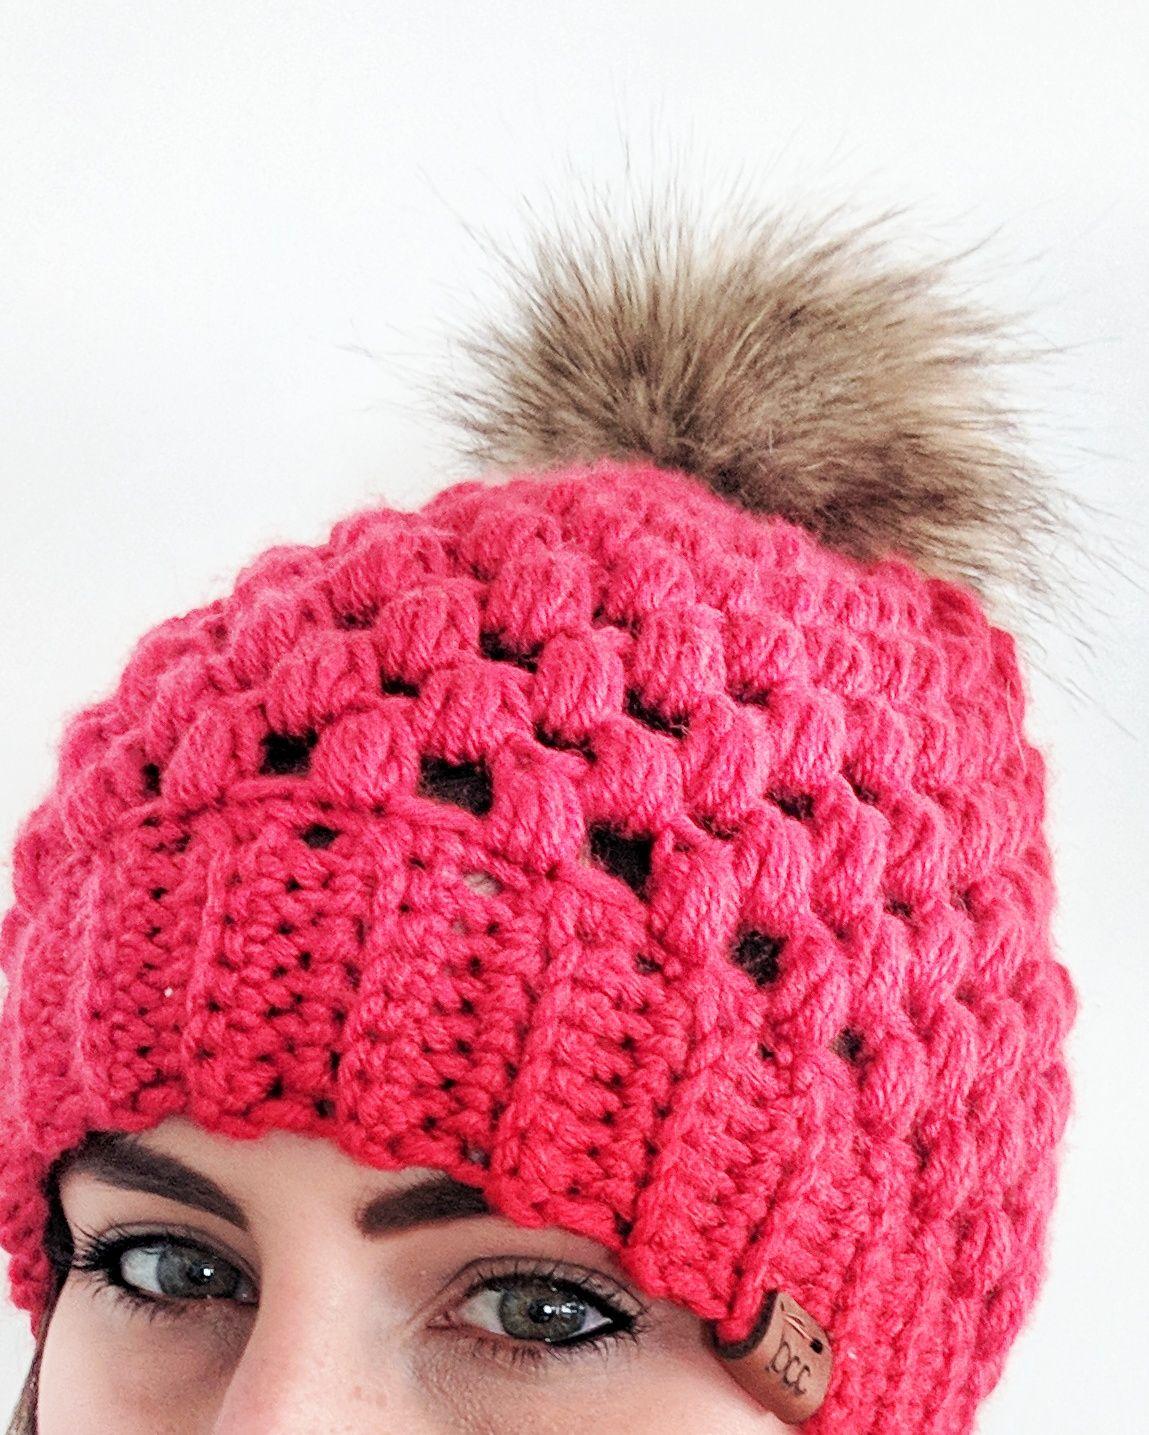 e078cbf5088 crochet pom pom hat- The Puff  amp  Pom beanie from Bella s Custom Crochets-